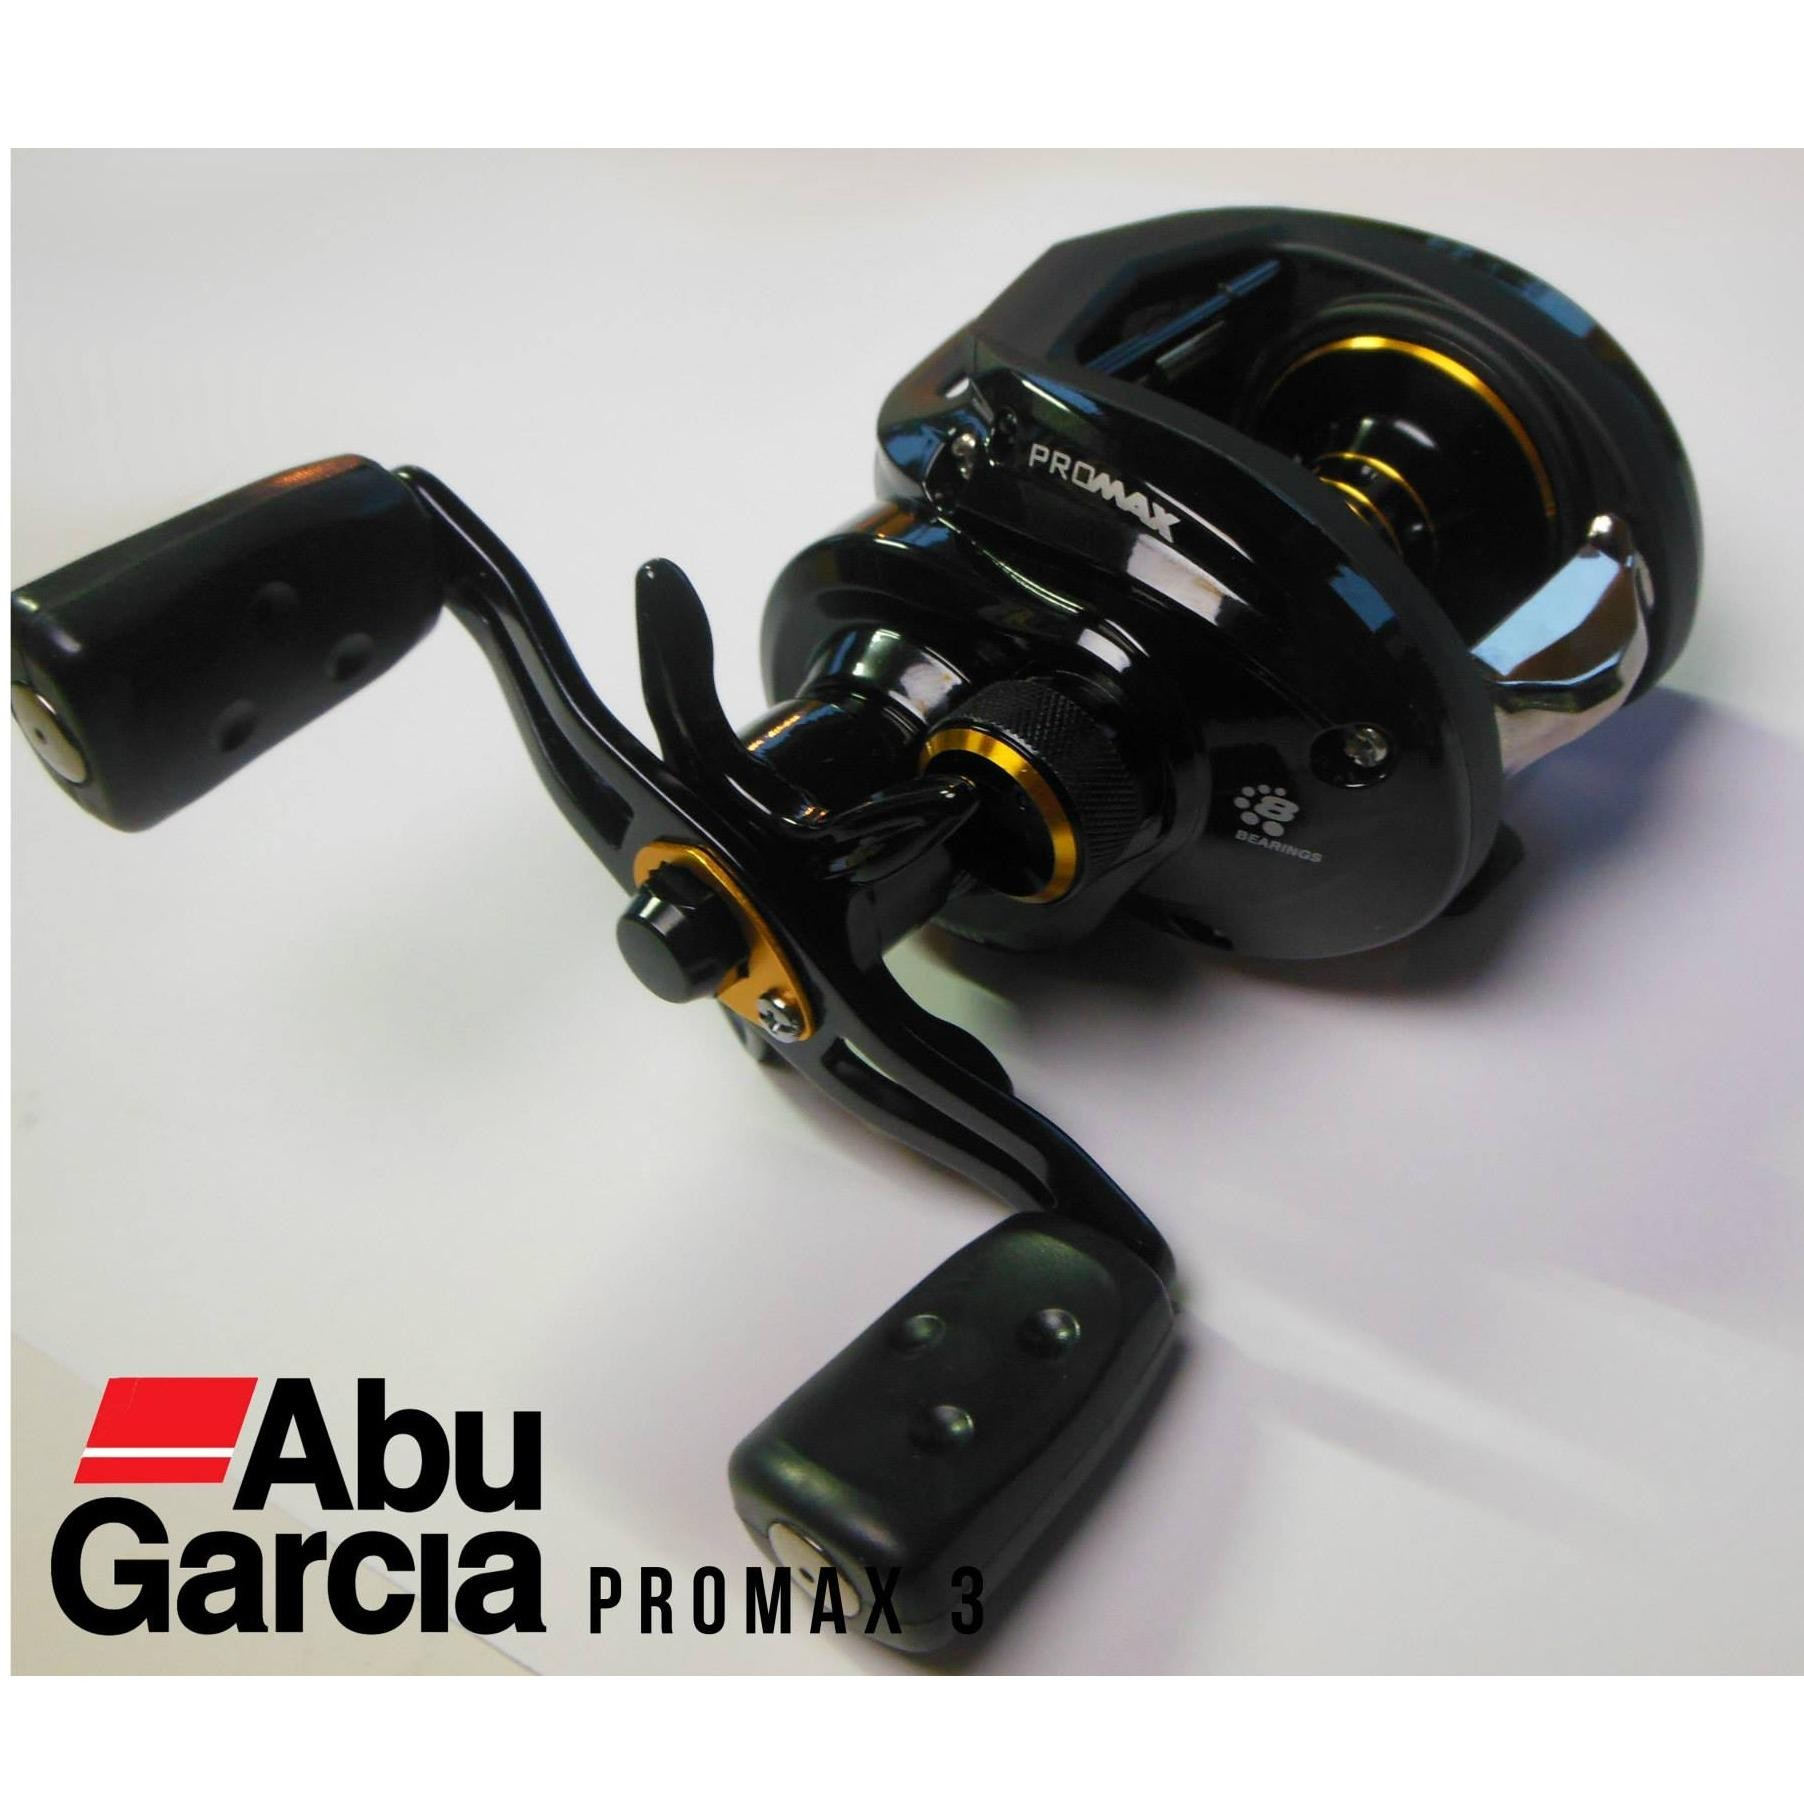 Abu Garcia Reel Parts Diagram Abu Garcia Products for the Best Prices In Malaysia Of Abu Garcia Reel Parts Diagram